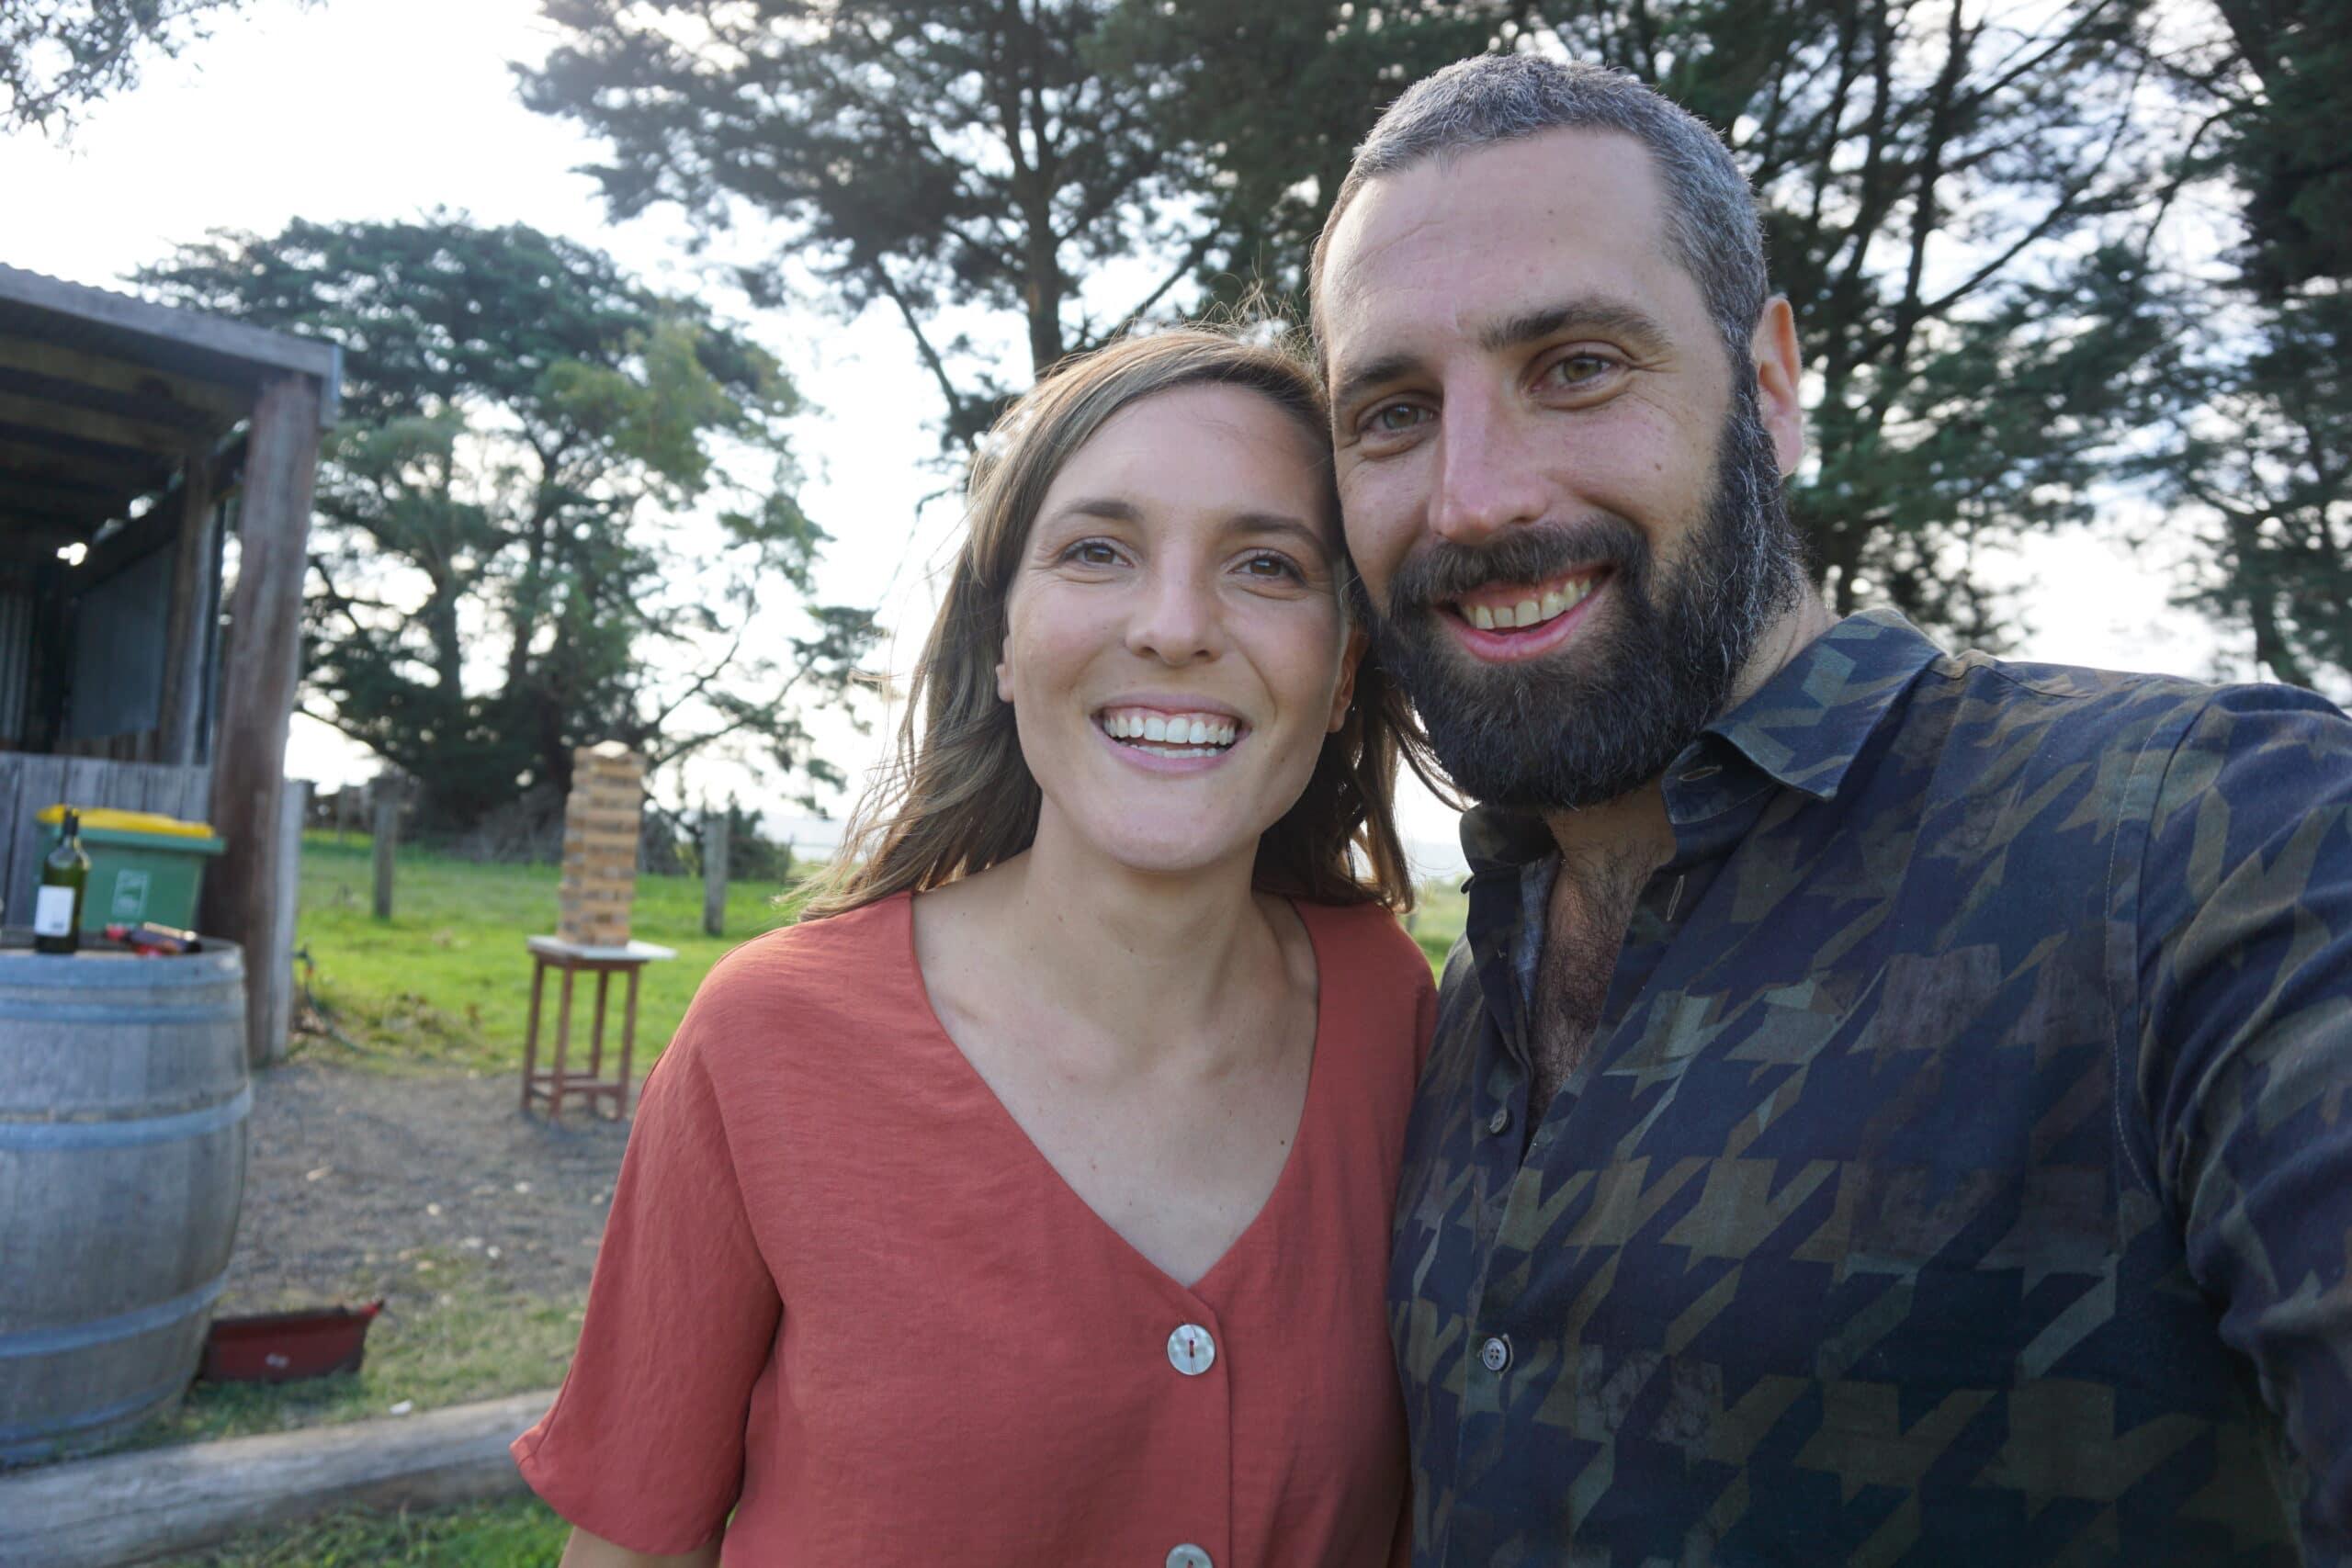 Michael and sister Joanna